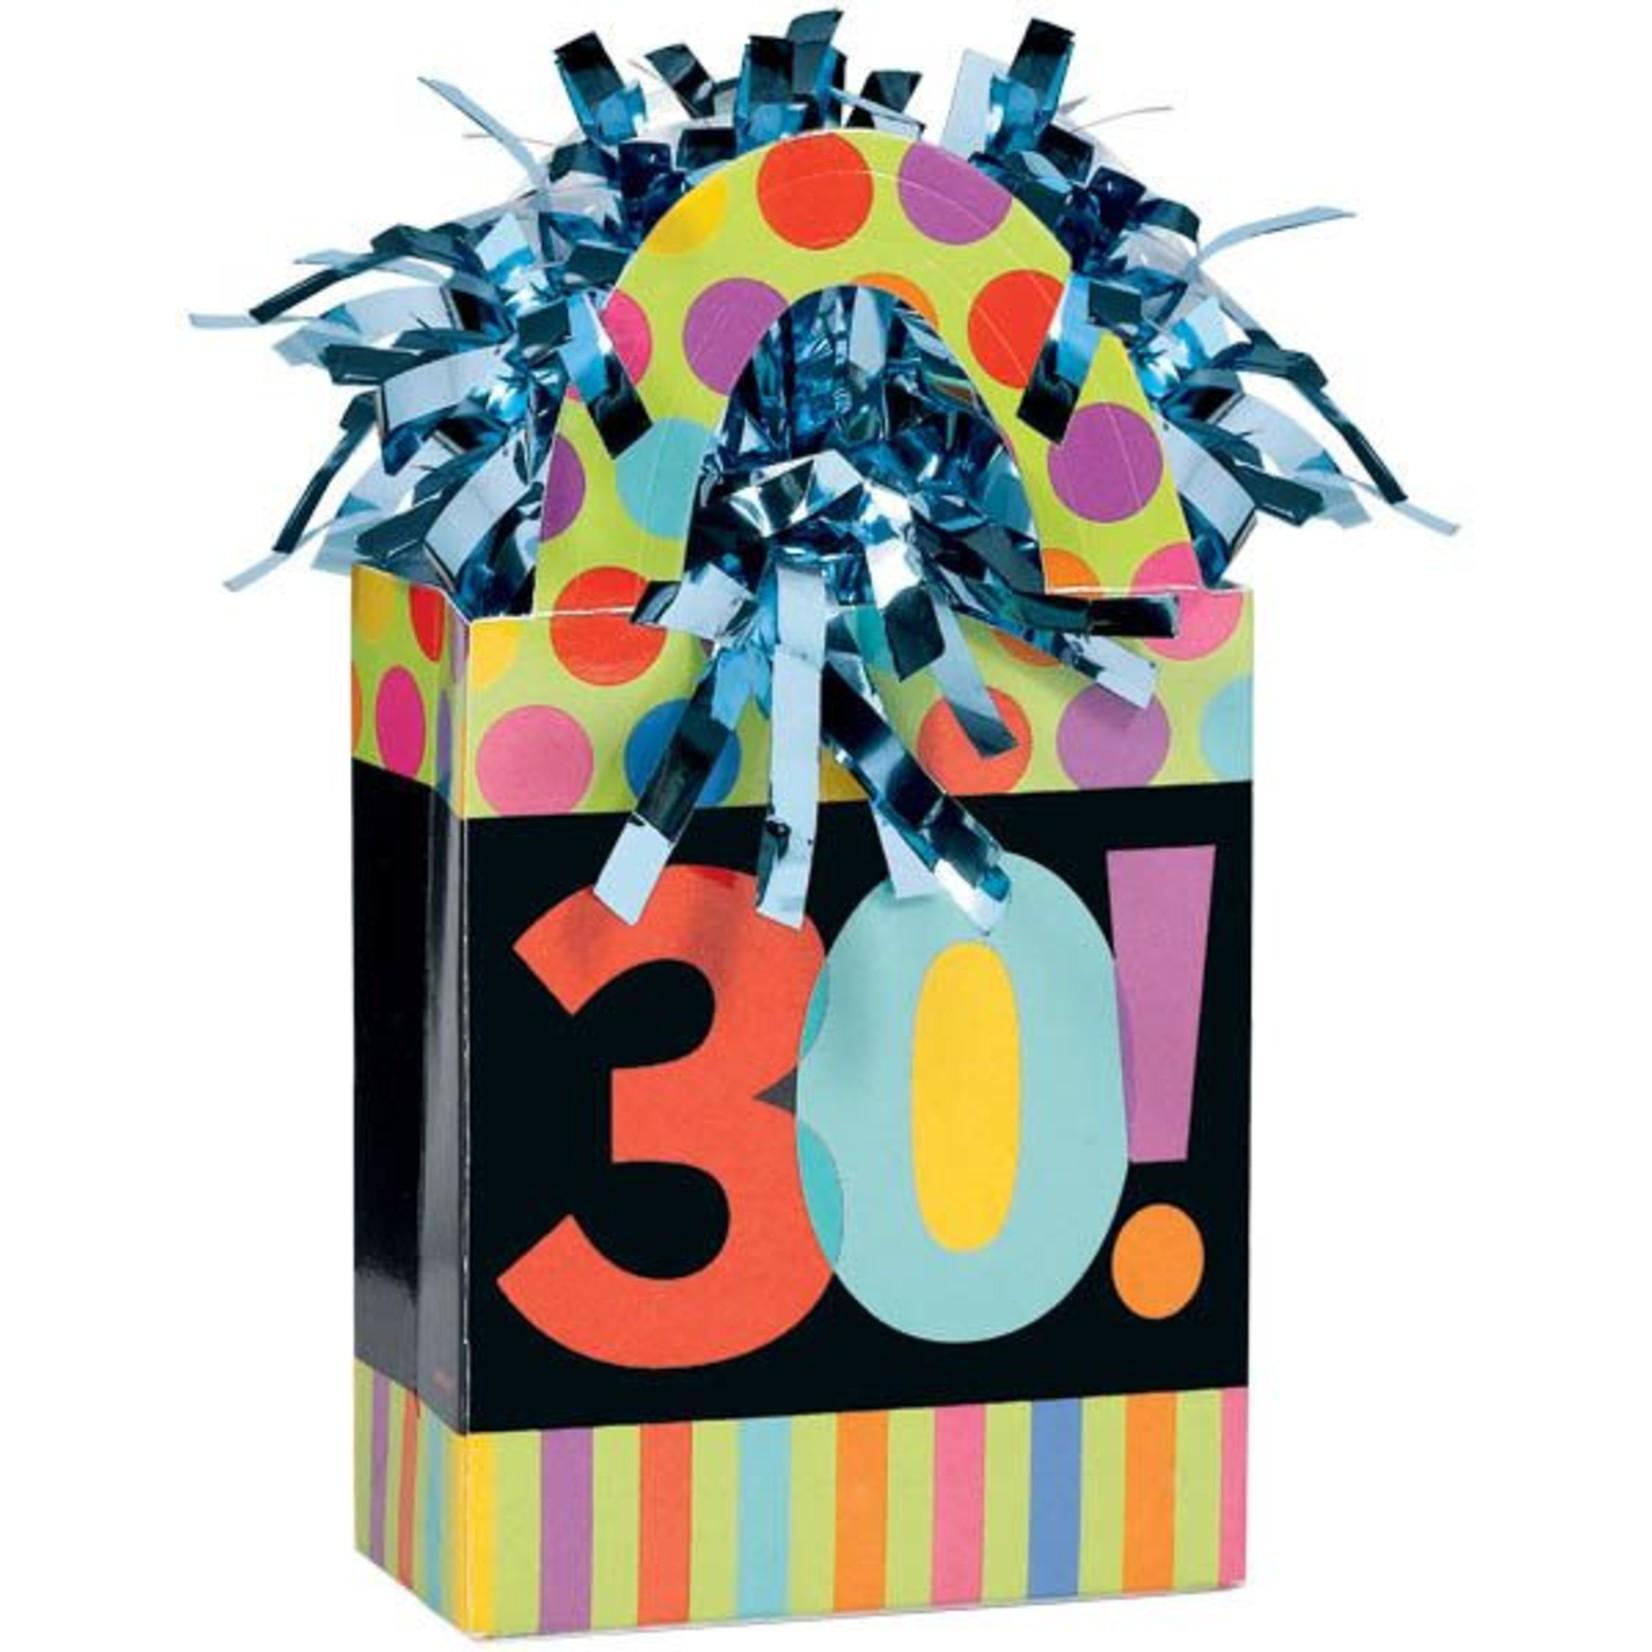 Balloon Weight-Dots & Stripes 30th Bday-5.7oz